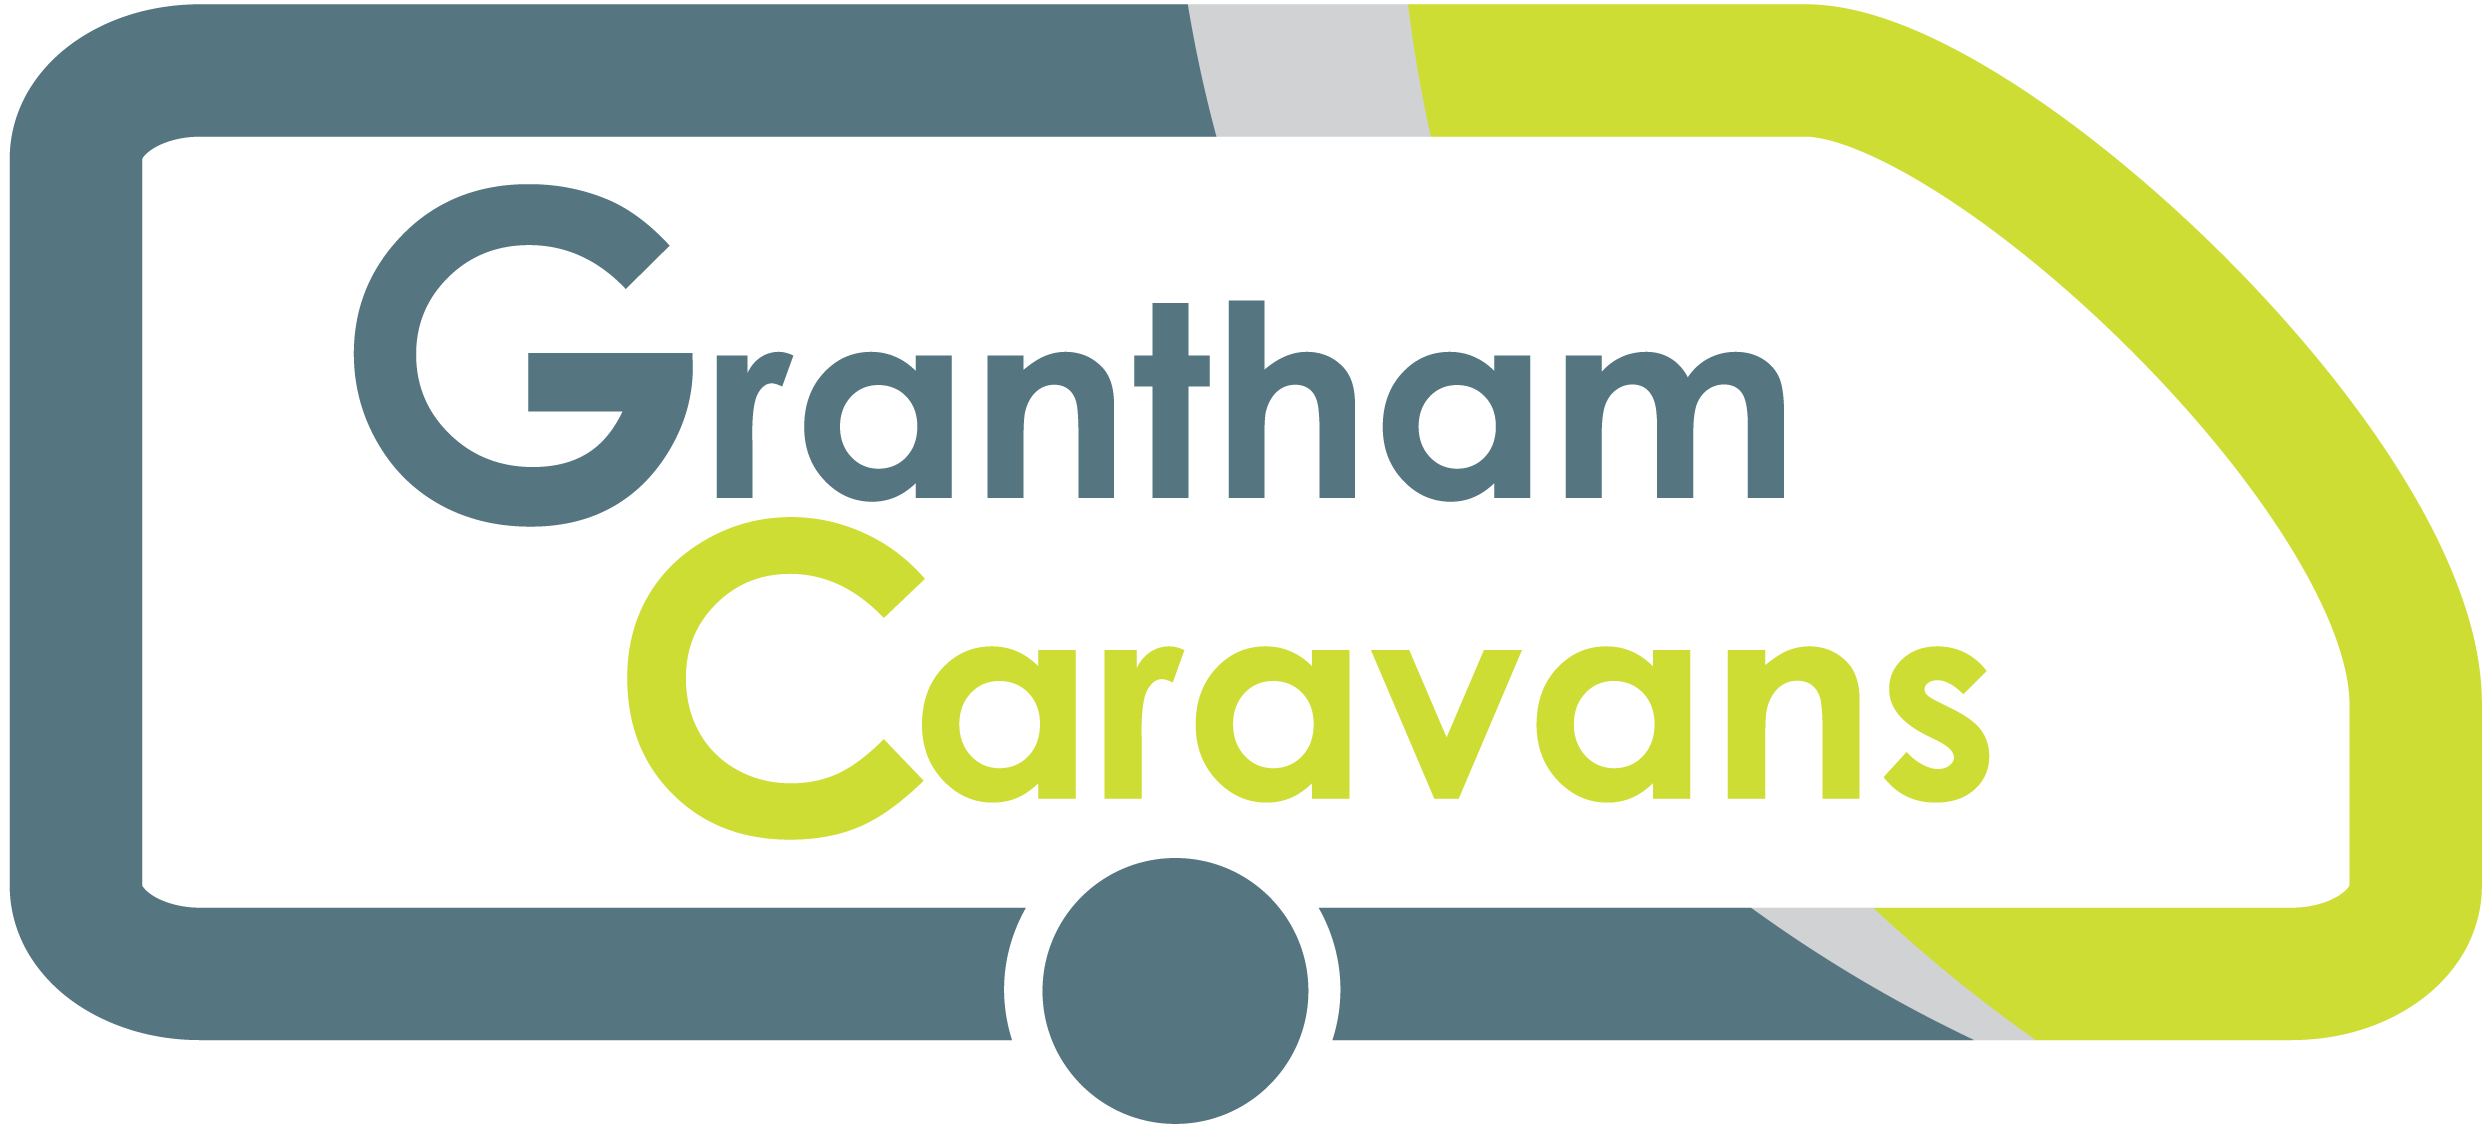 Grantham Caravans